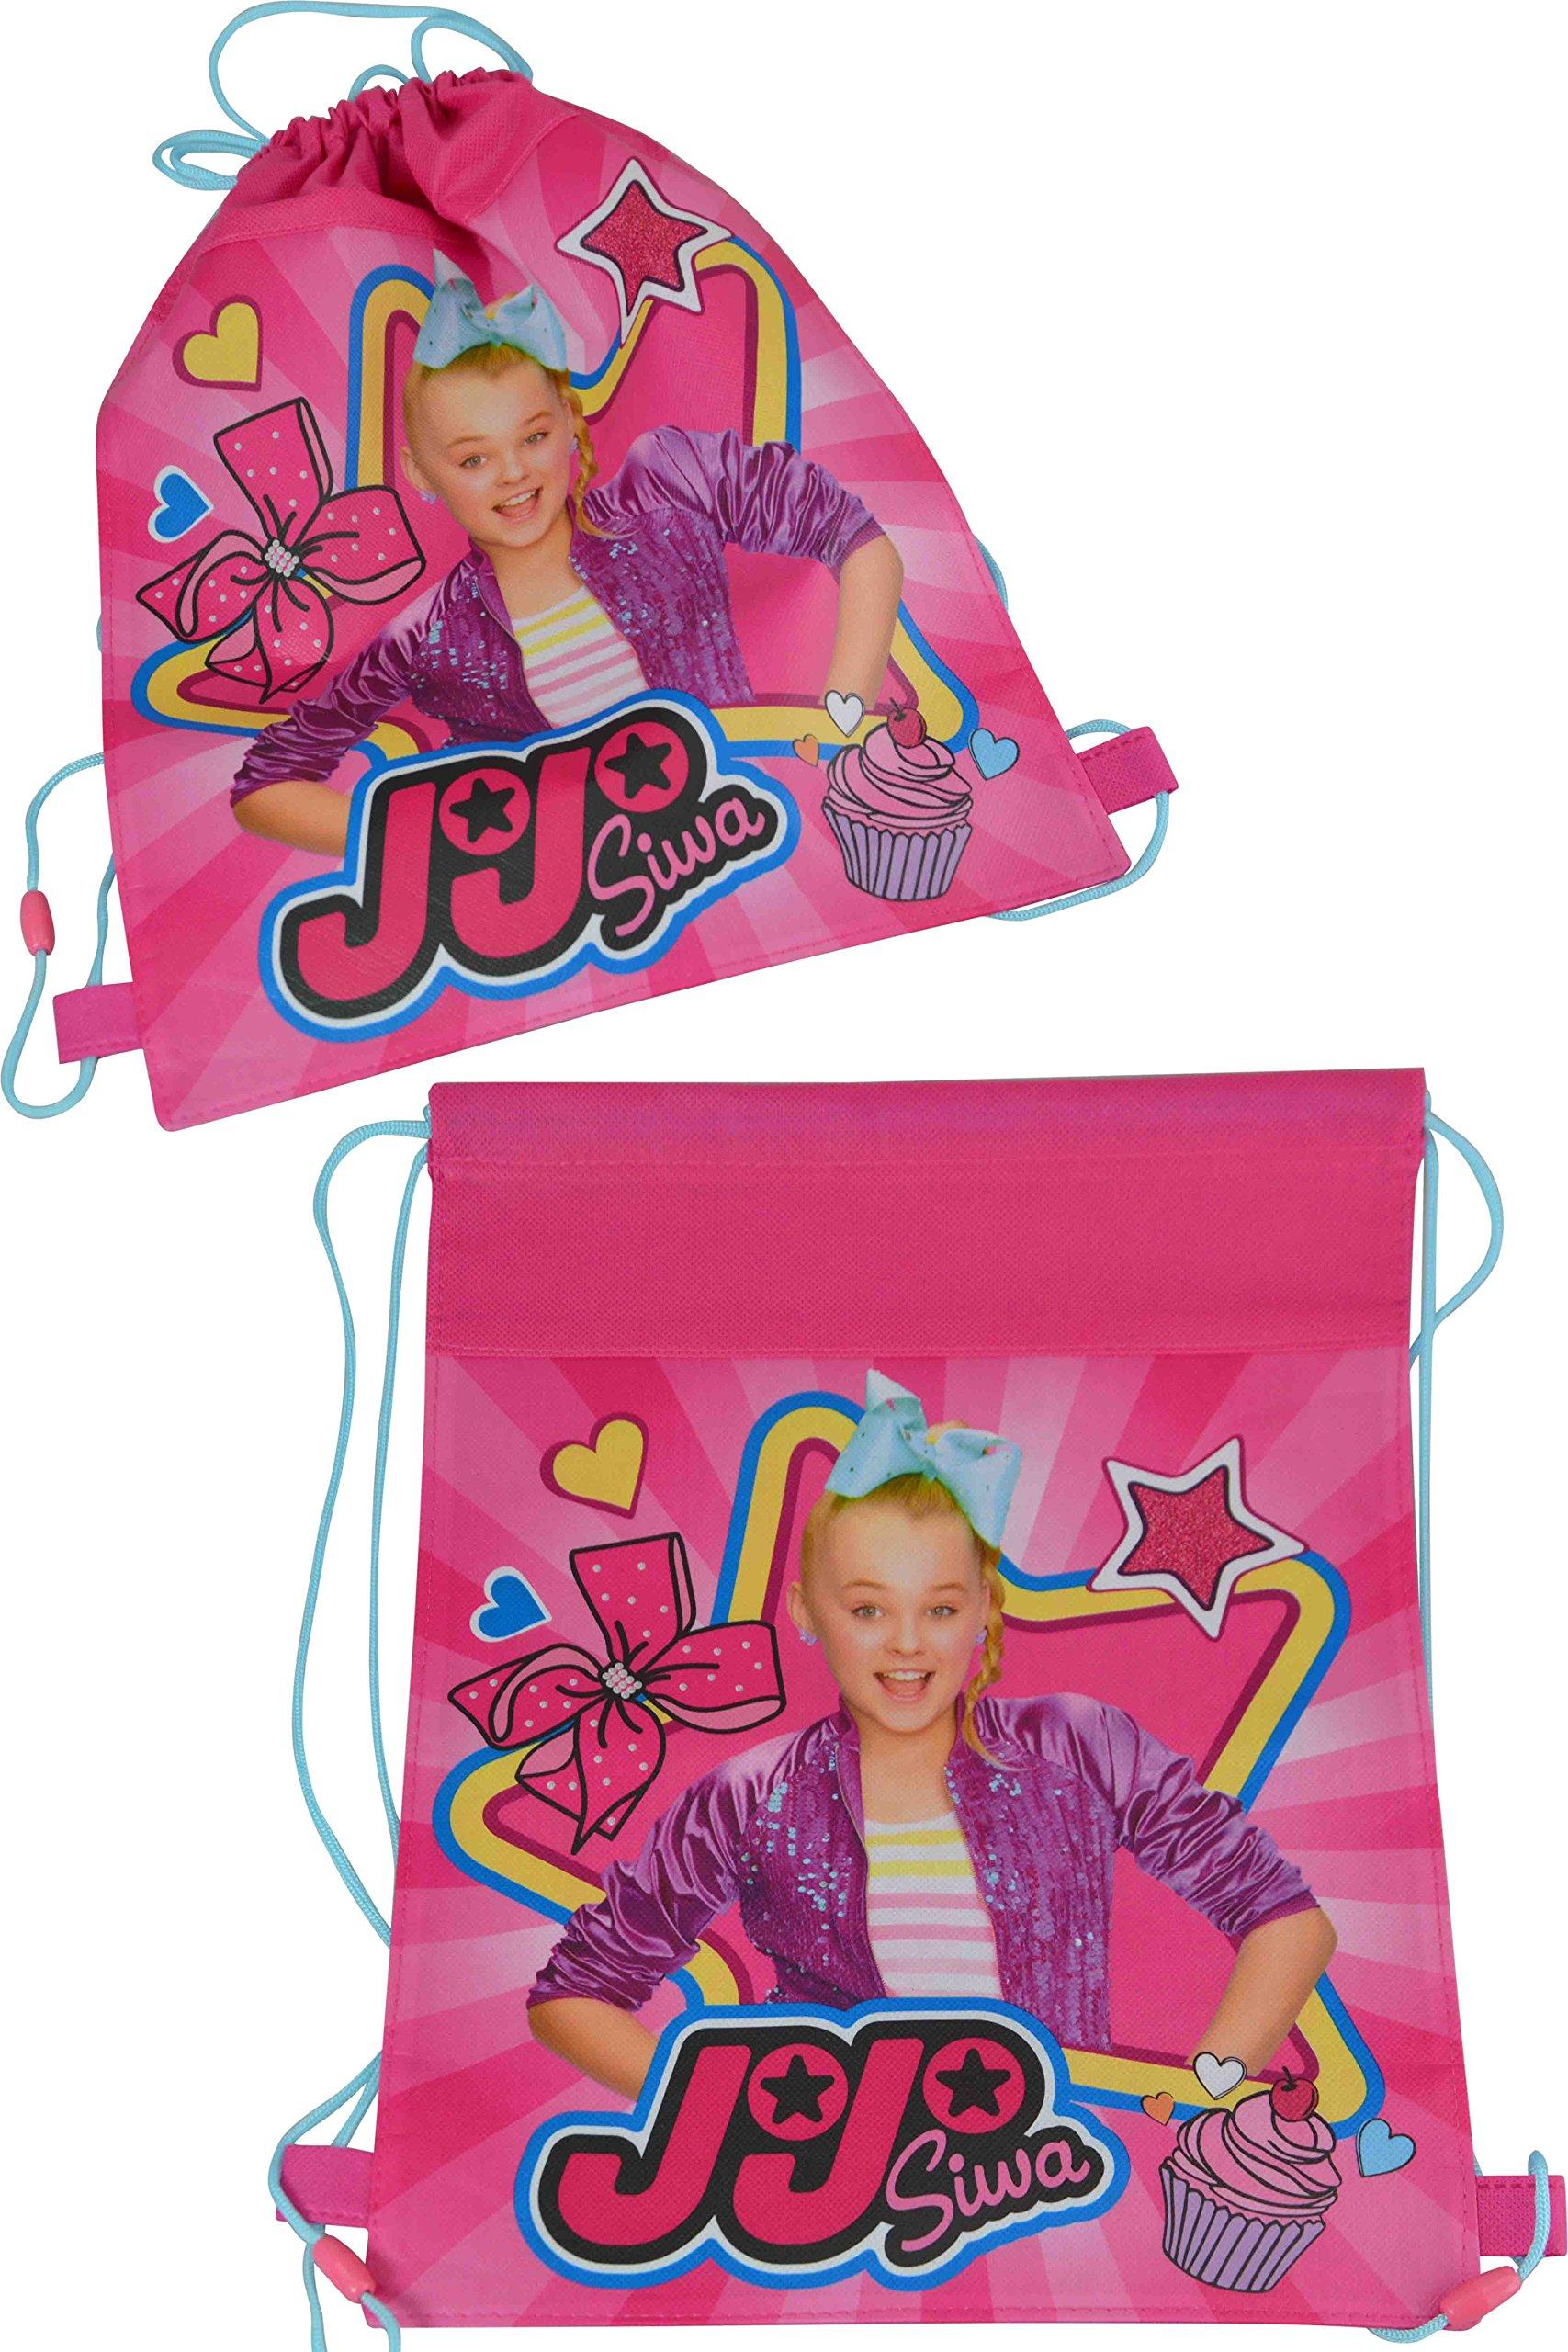 Amazon.com: JoJo Siwa 2pk Manual Toothbrush: Beauty